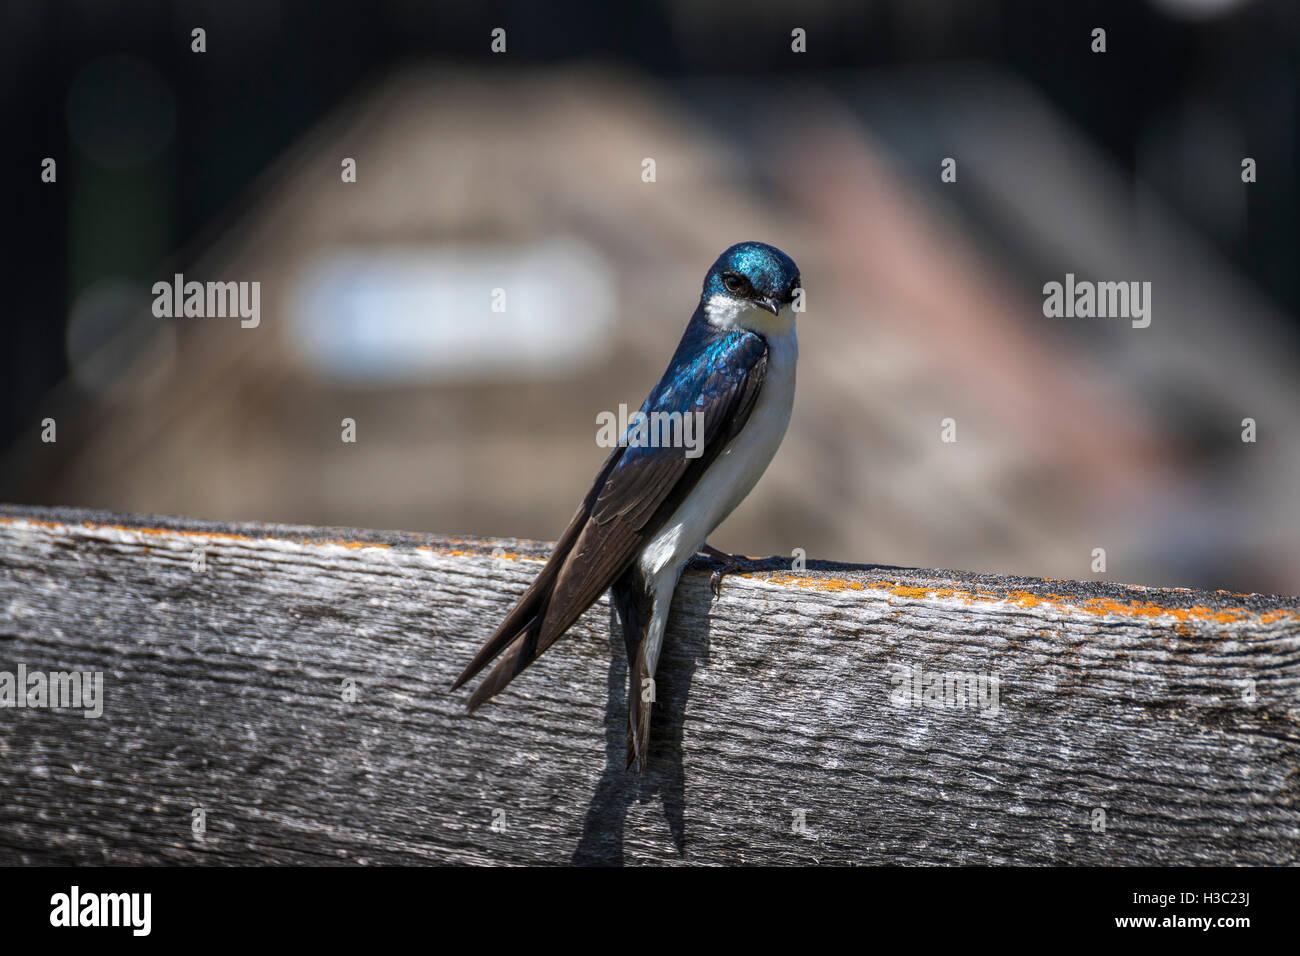 Little tree swallow - Stock Image